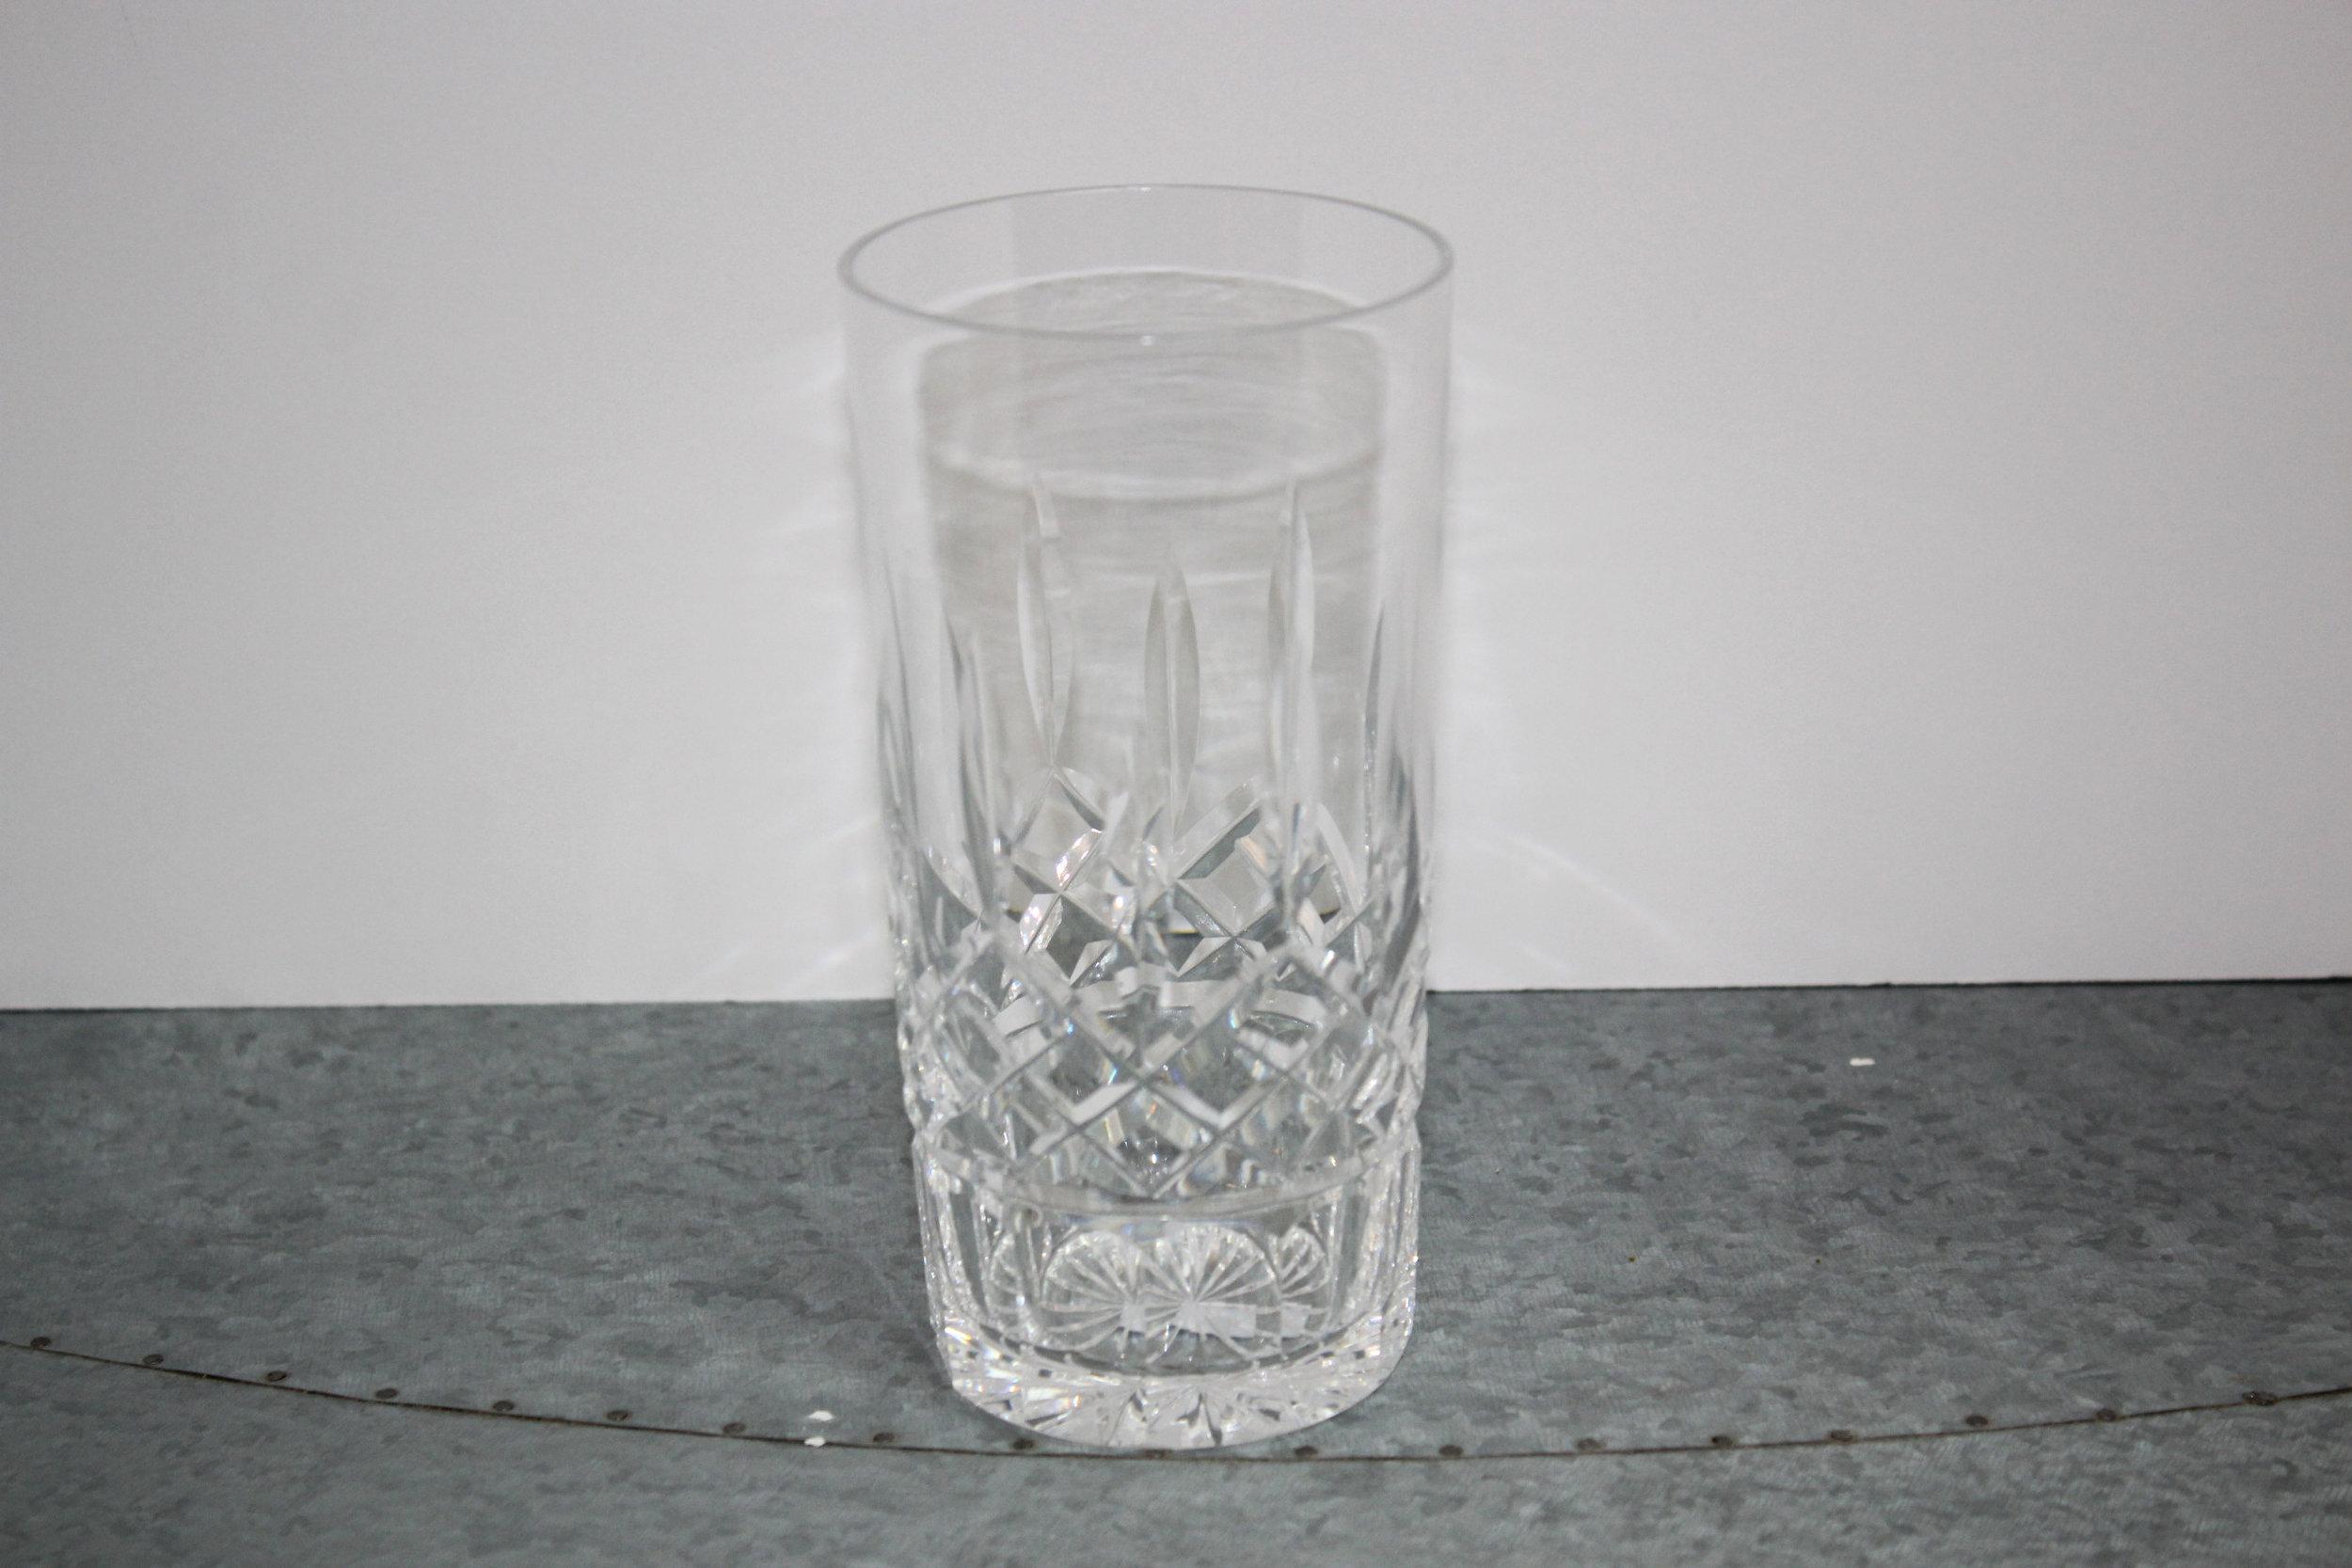 Set of 12 Lismore Waterford High Balls Glasses